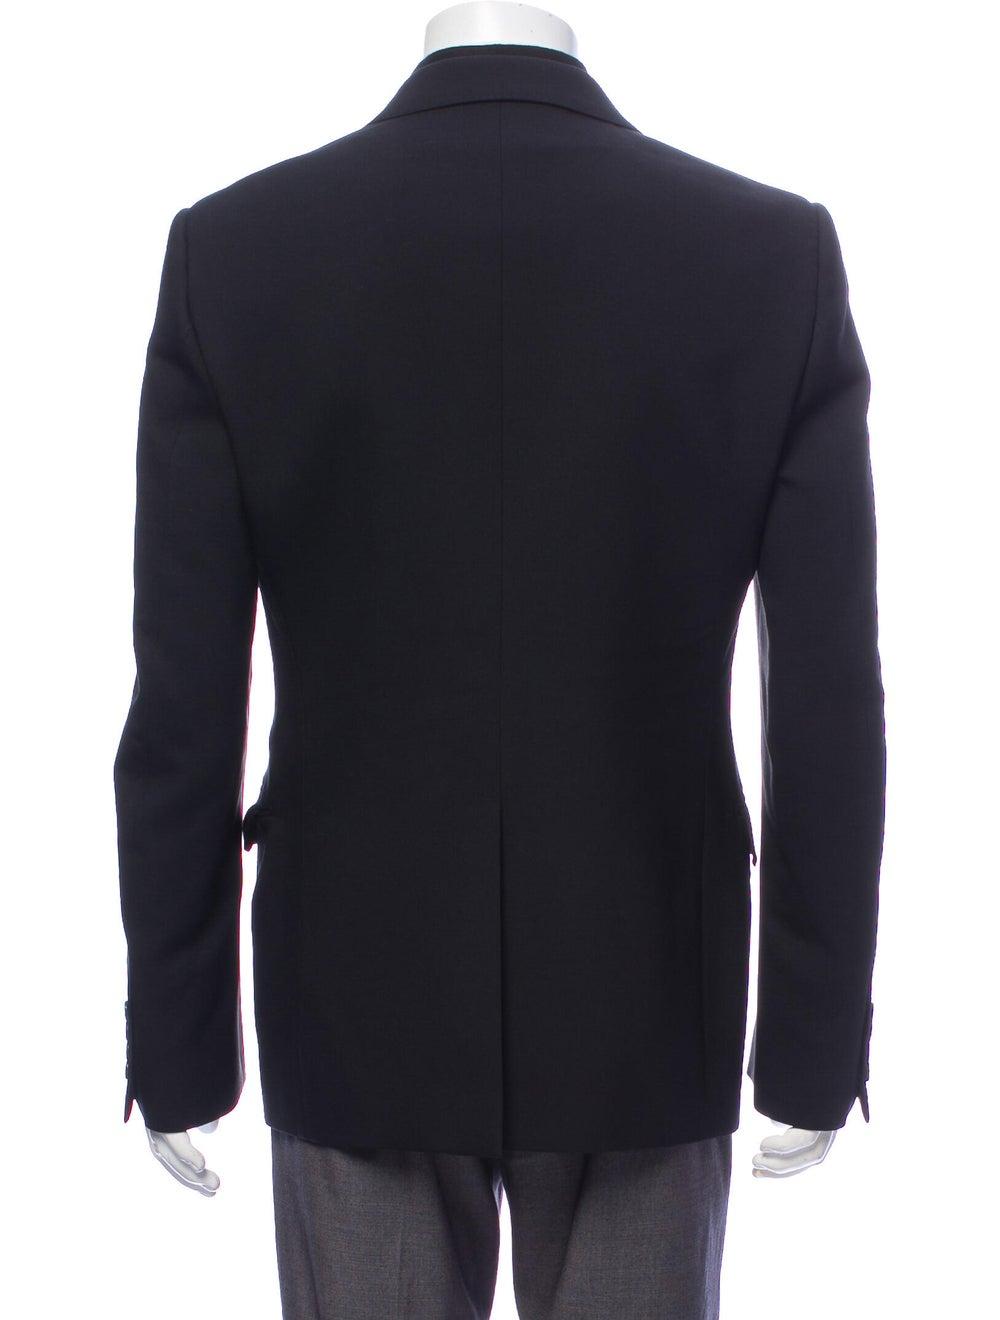 Alexander McQueen Wool Jacket Wool - image 3